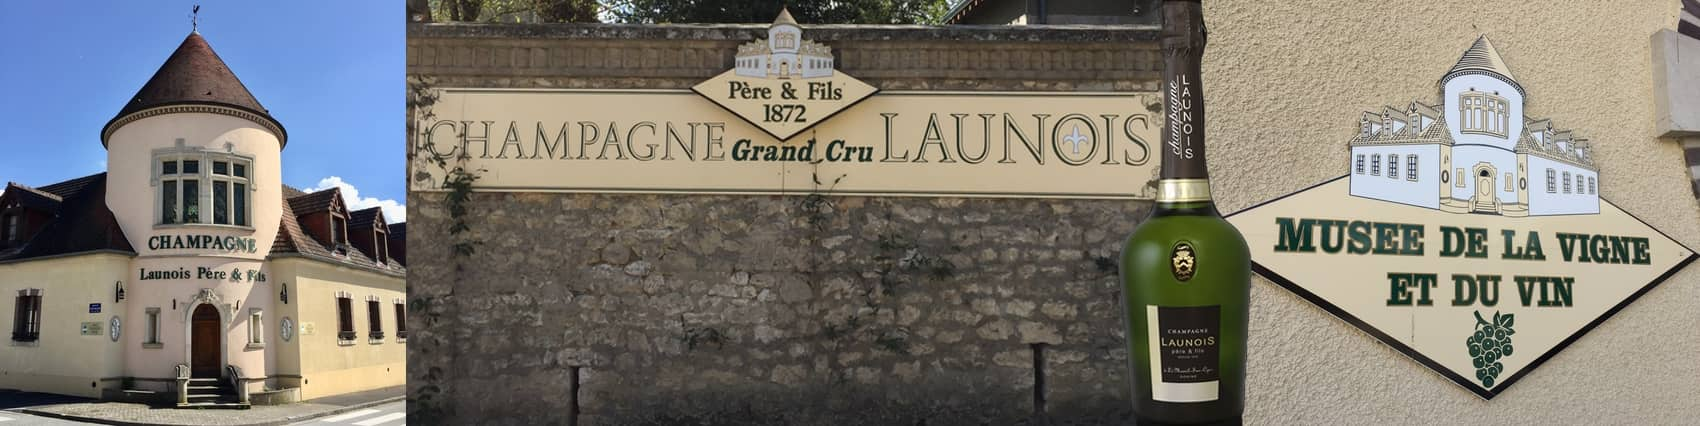 Launois Champagne Grand Cru